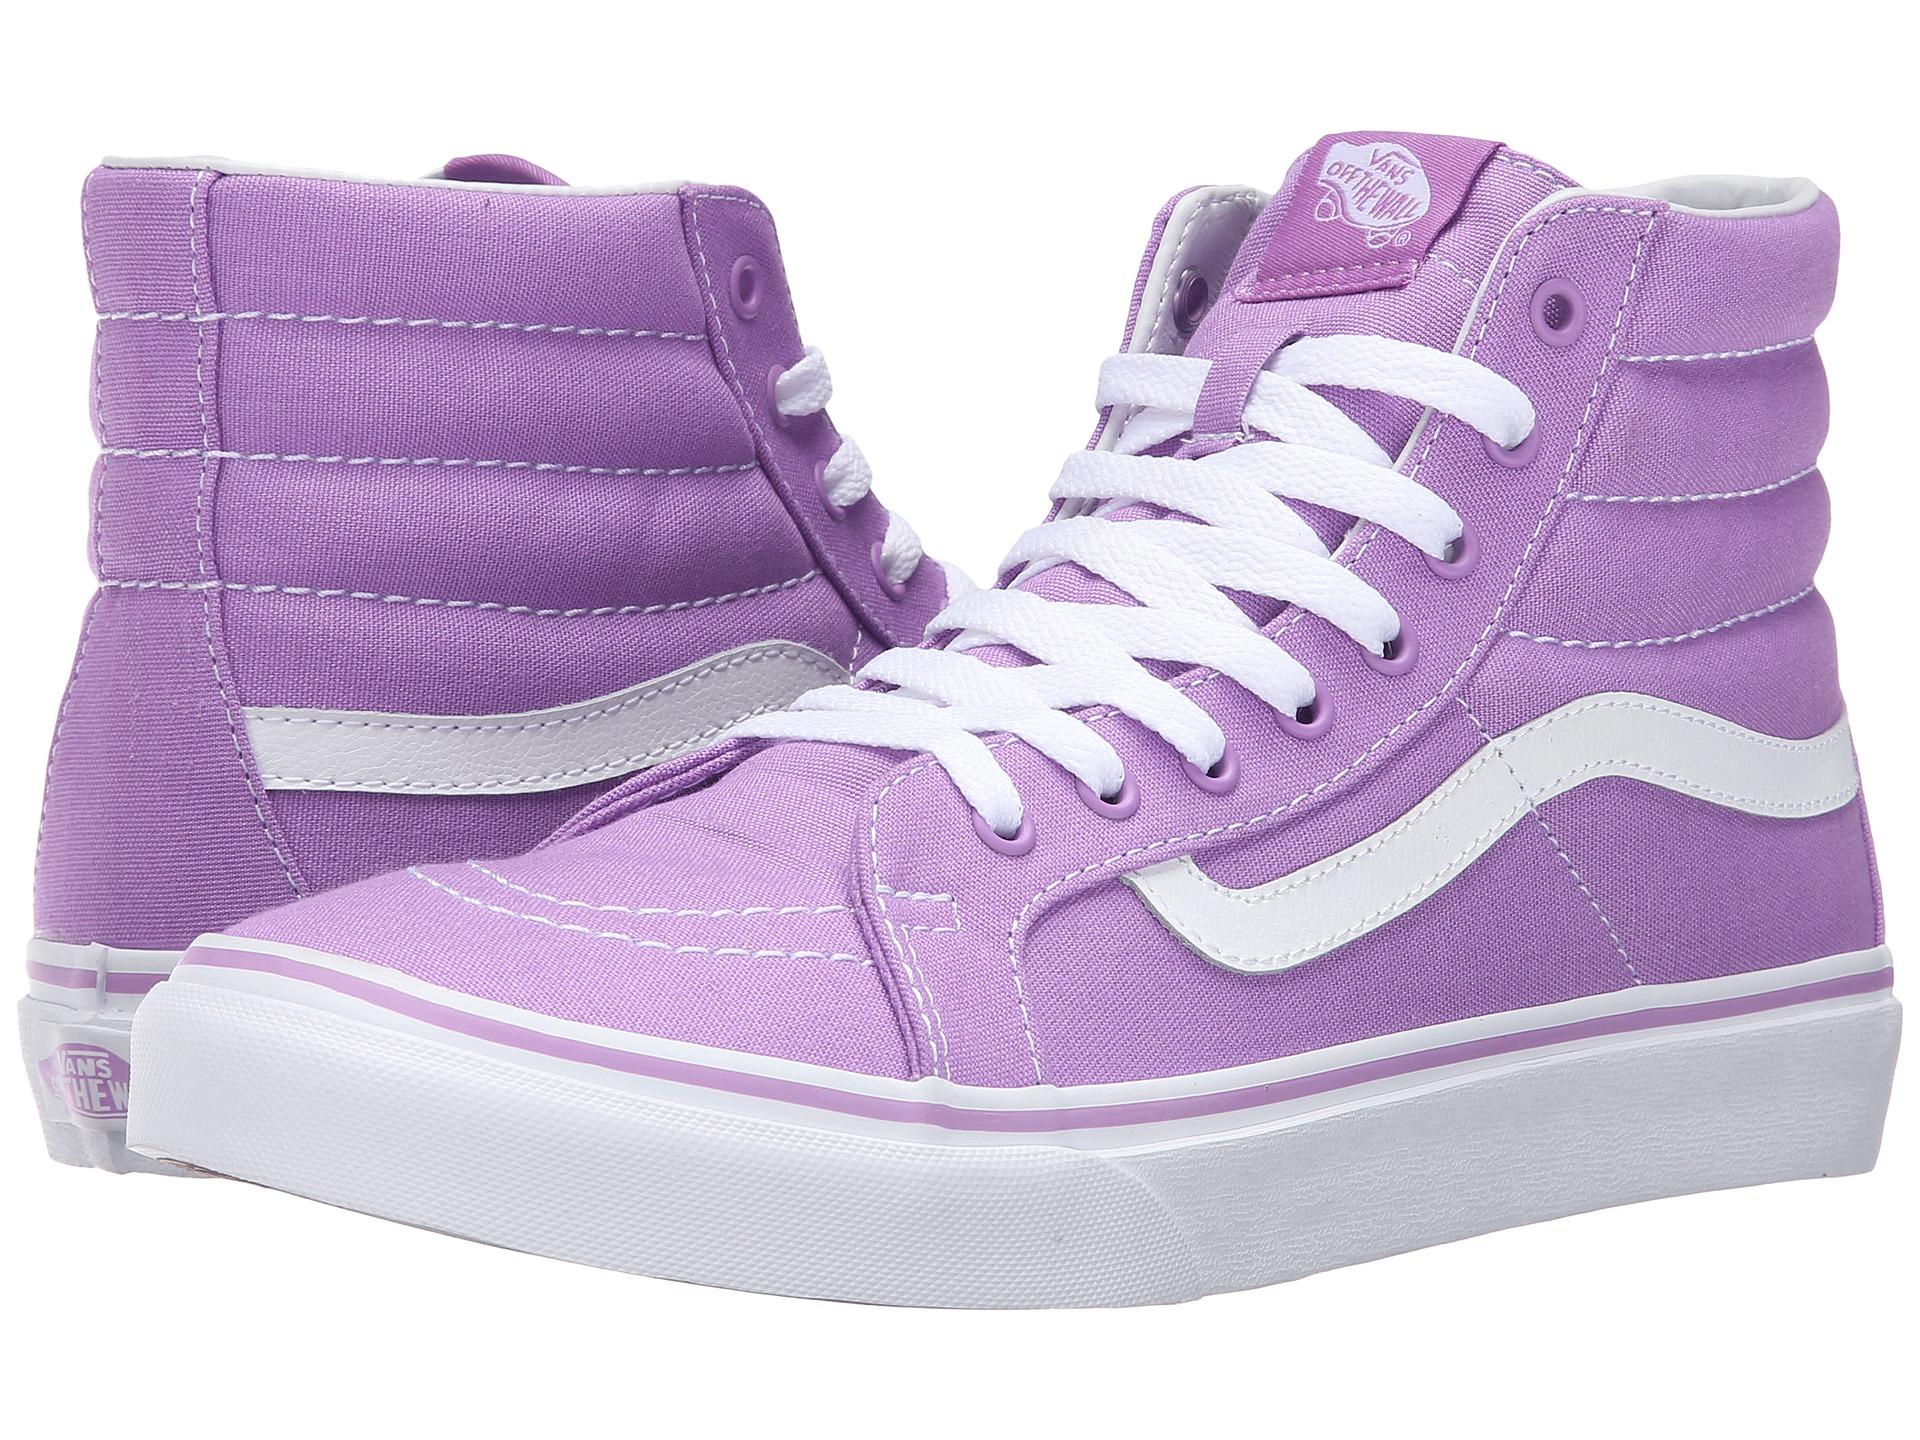 bac3e6779ea92 Lyst - Vans Sk8-hi Slim in Purple